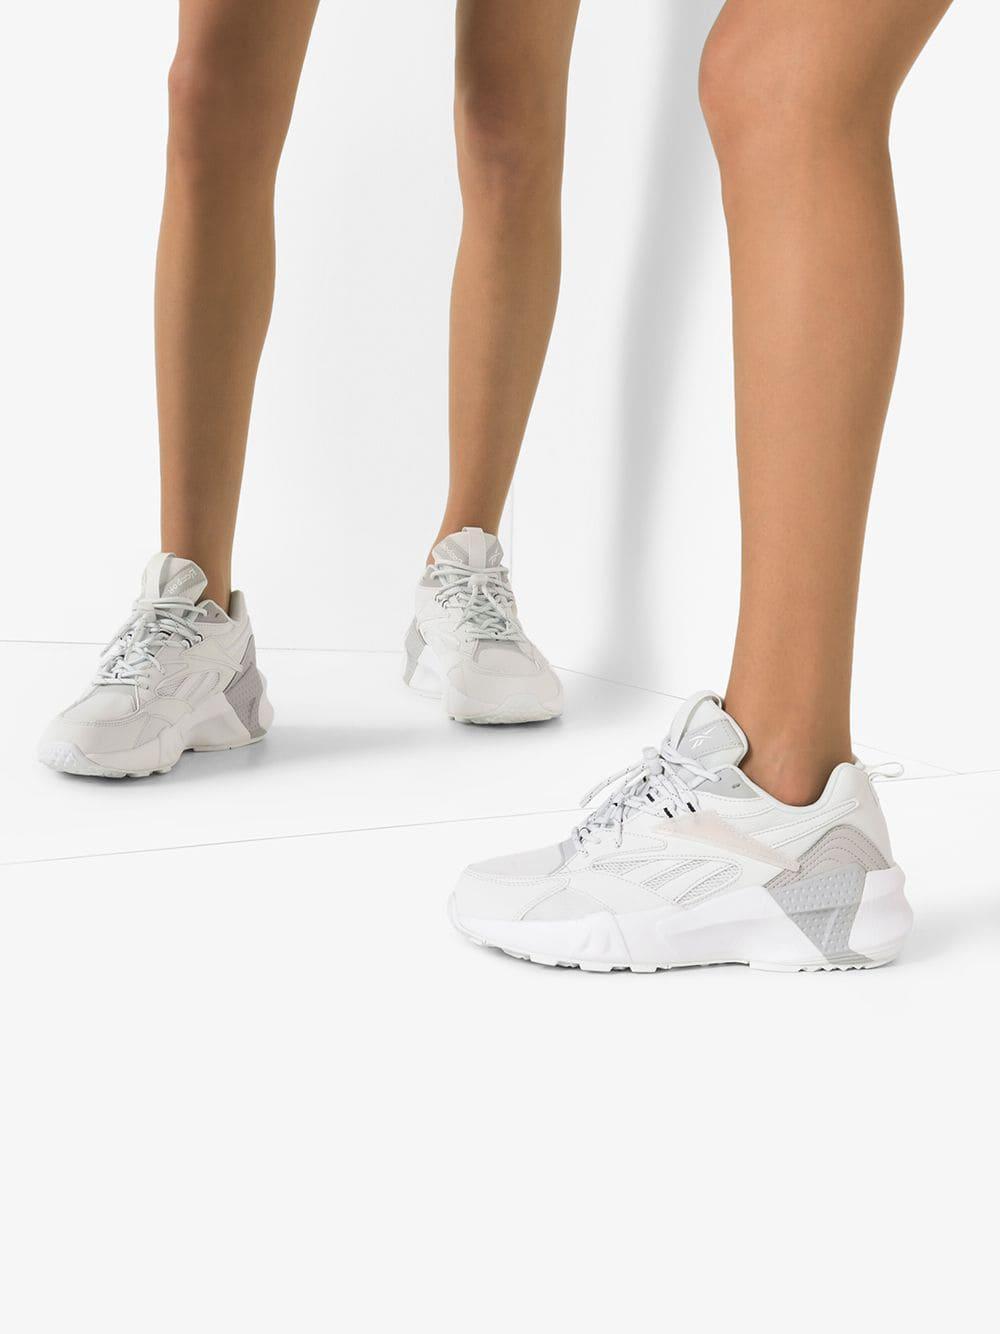 billigaste mode största rabatt Reebok Aztrek Double Nu Laces Sneakers in White - Lyst